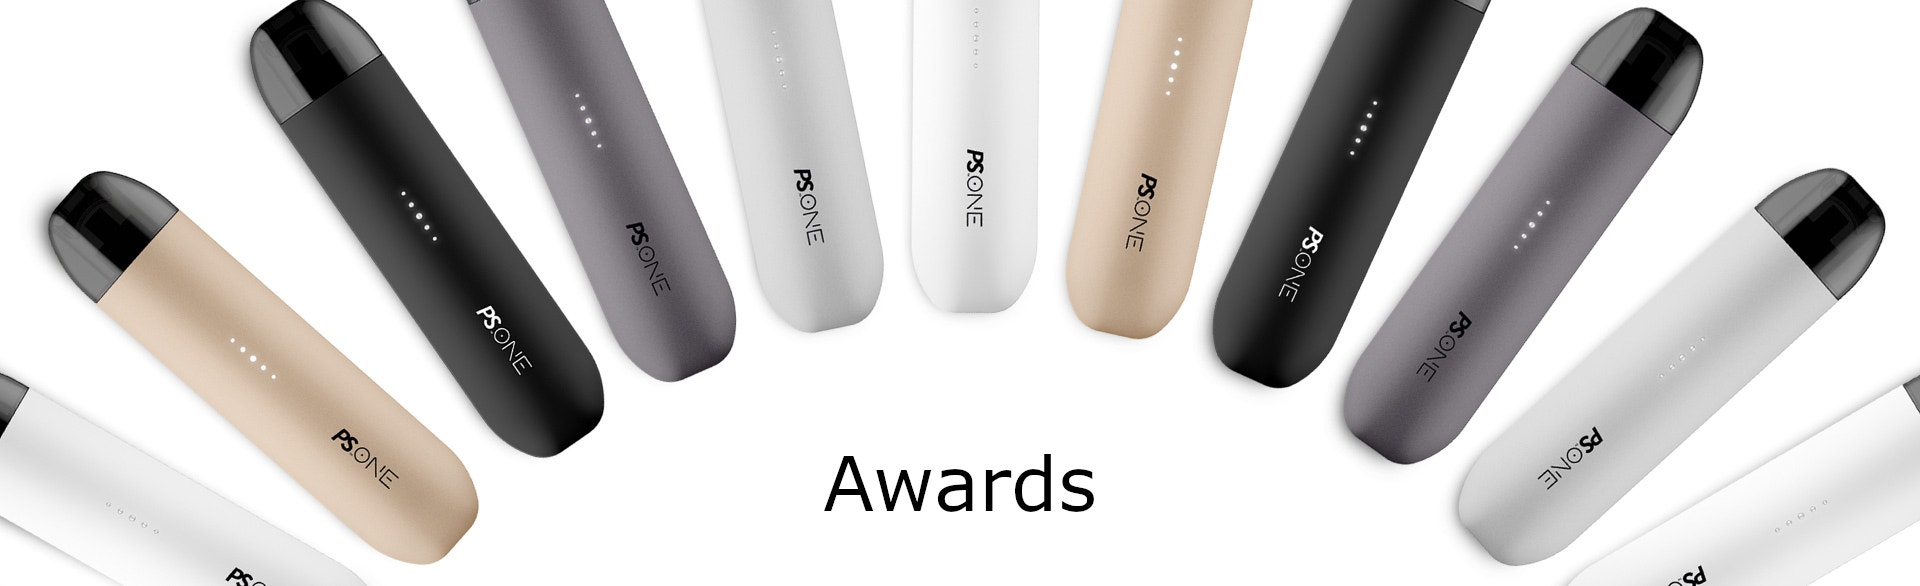 Pod Salt Awards